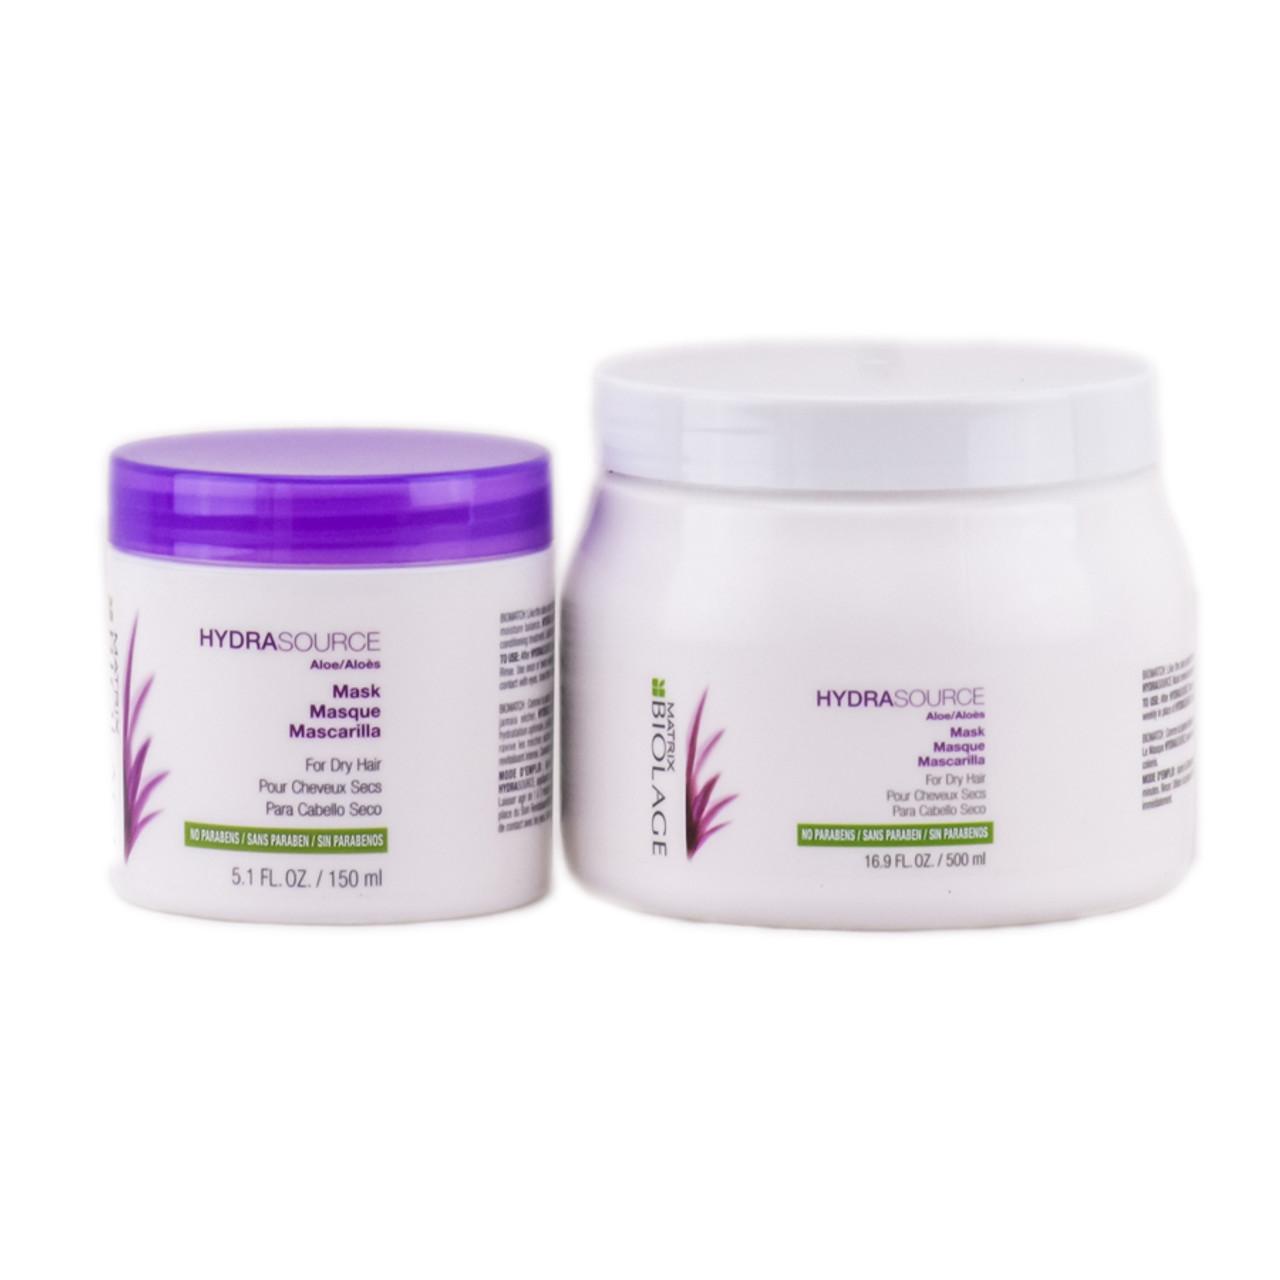 Matrix hair brush 4 - Matrix Biolage Hydrasource Mask For Dry Hair